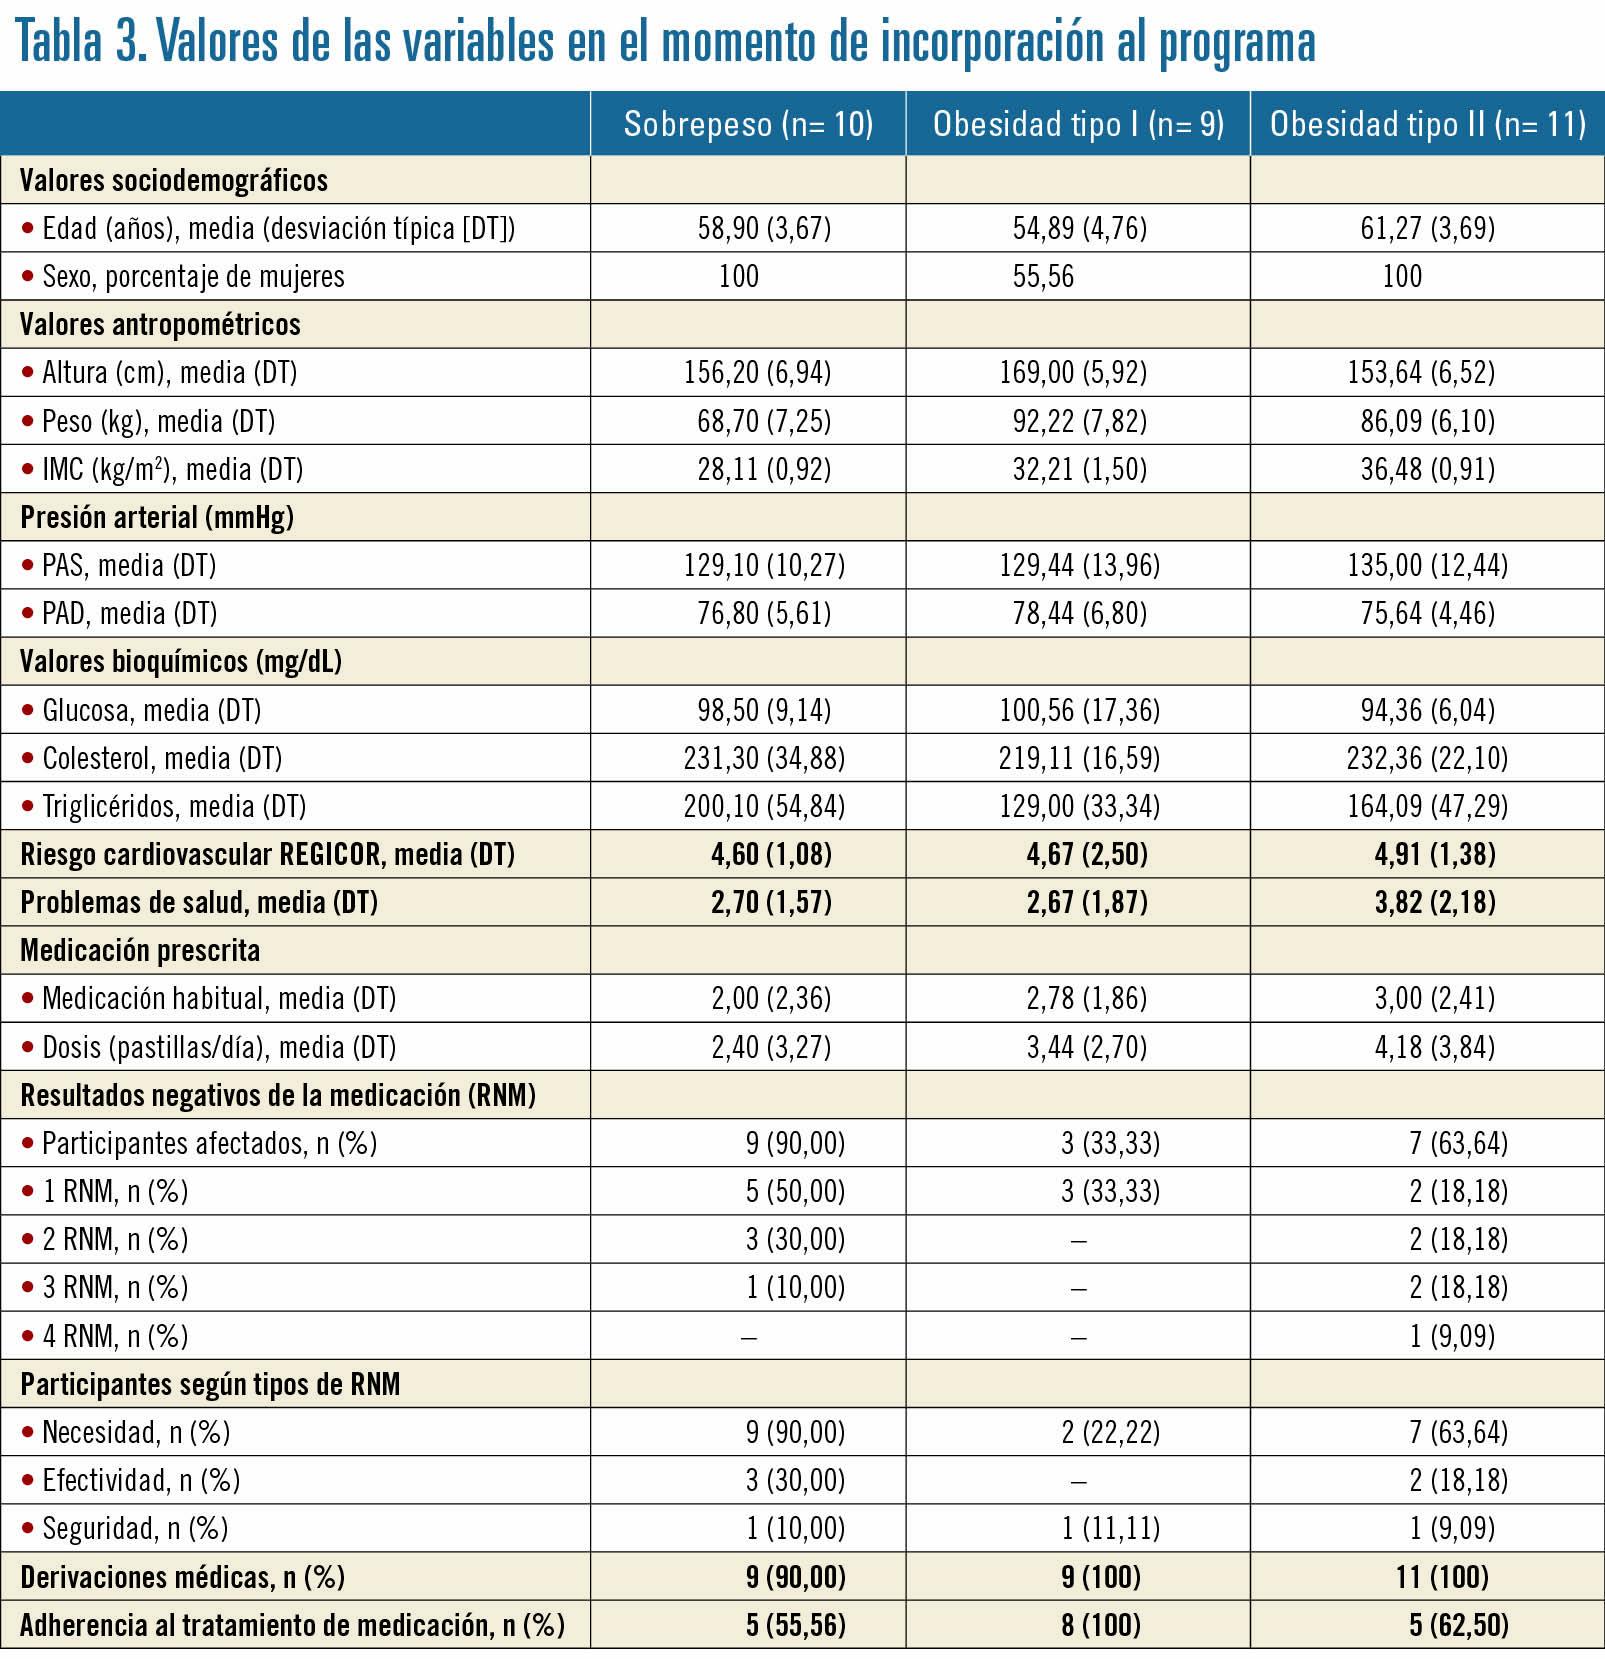 27 EF582 OFICINA FARMACIA ANALISIS tabla 3